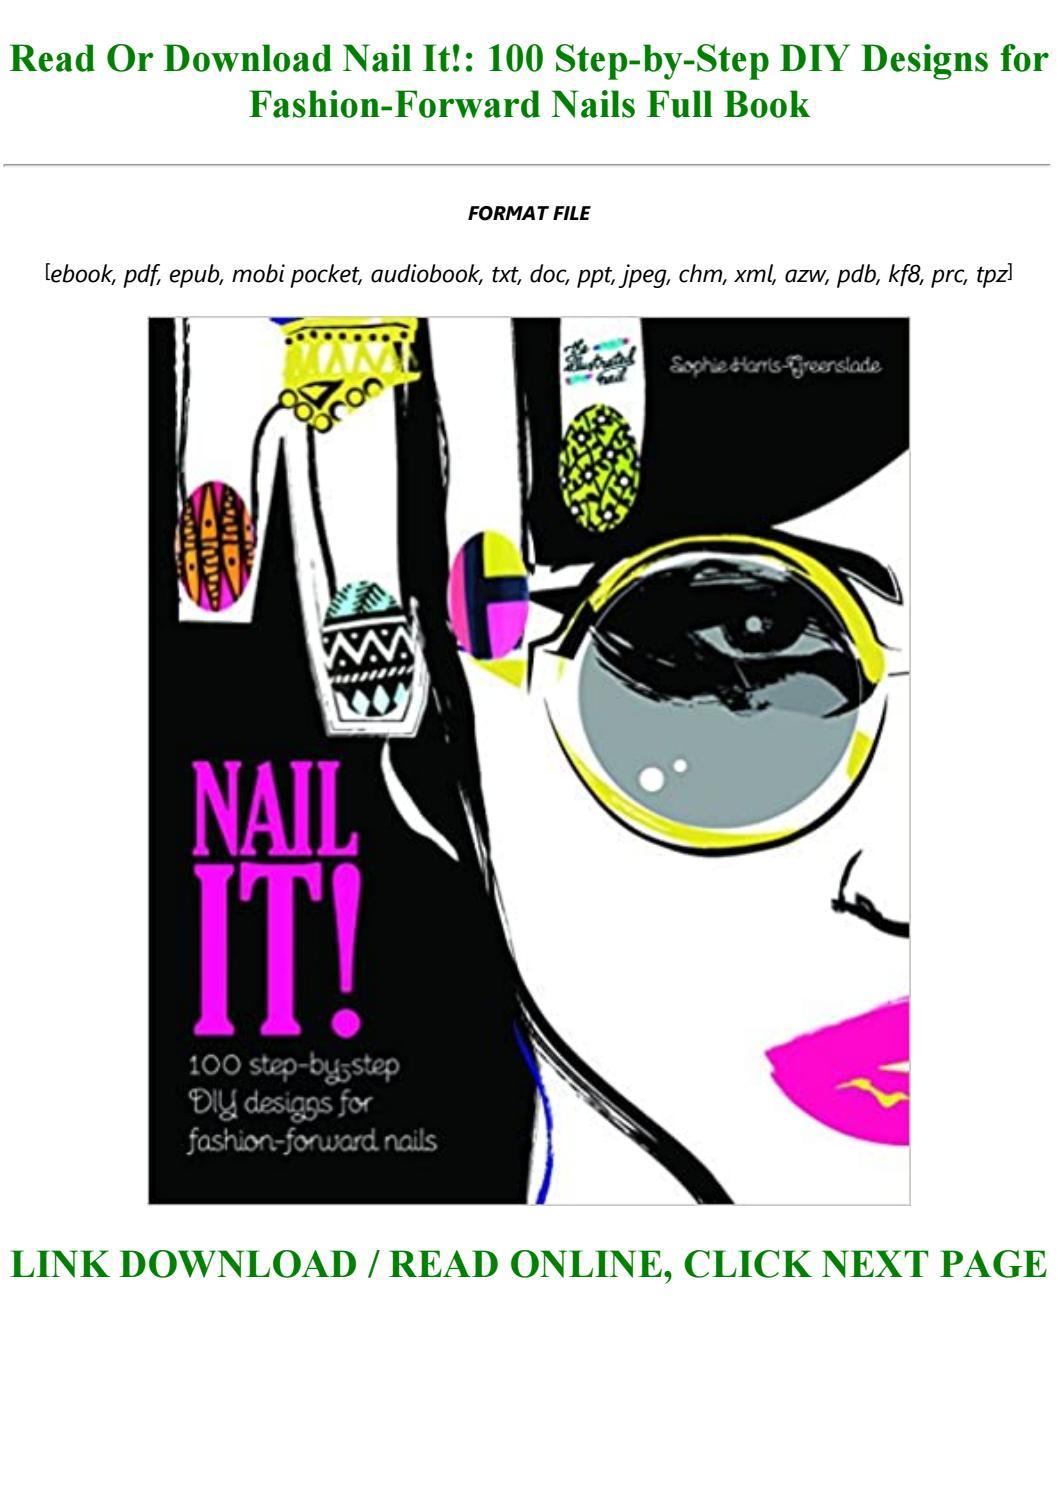 P D F D O W N L O A D Nail It 100 Step By Step Diy Designs For Fashion Forward Nails Full Pdf By Paulaibarra1997 Issuu